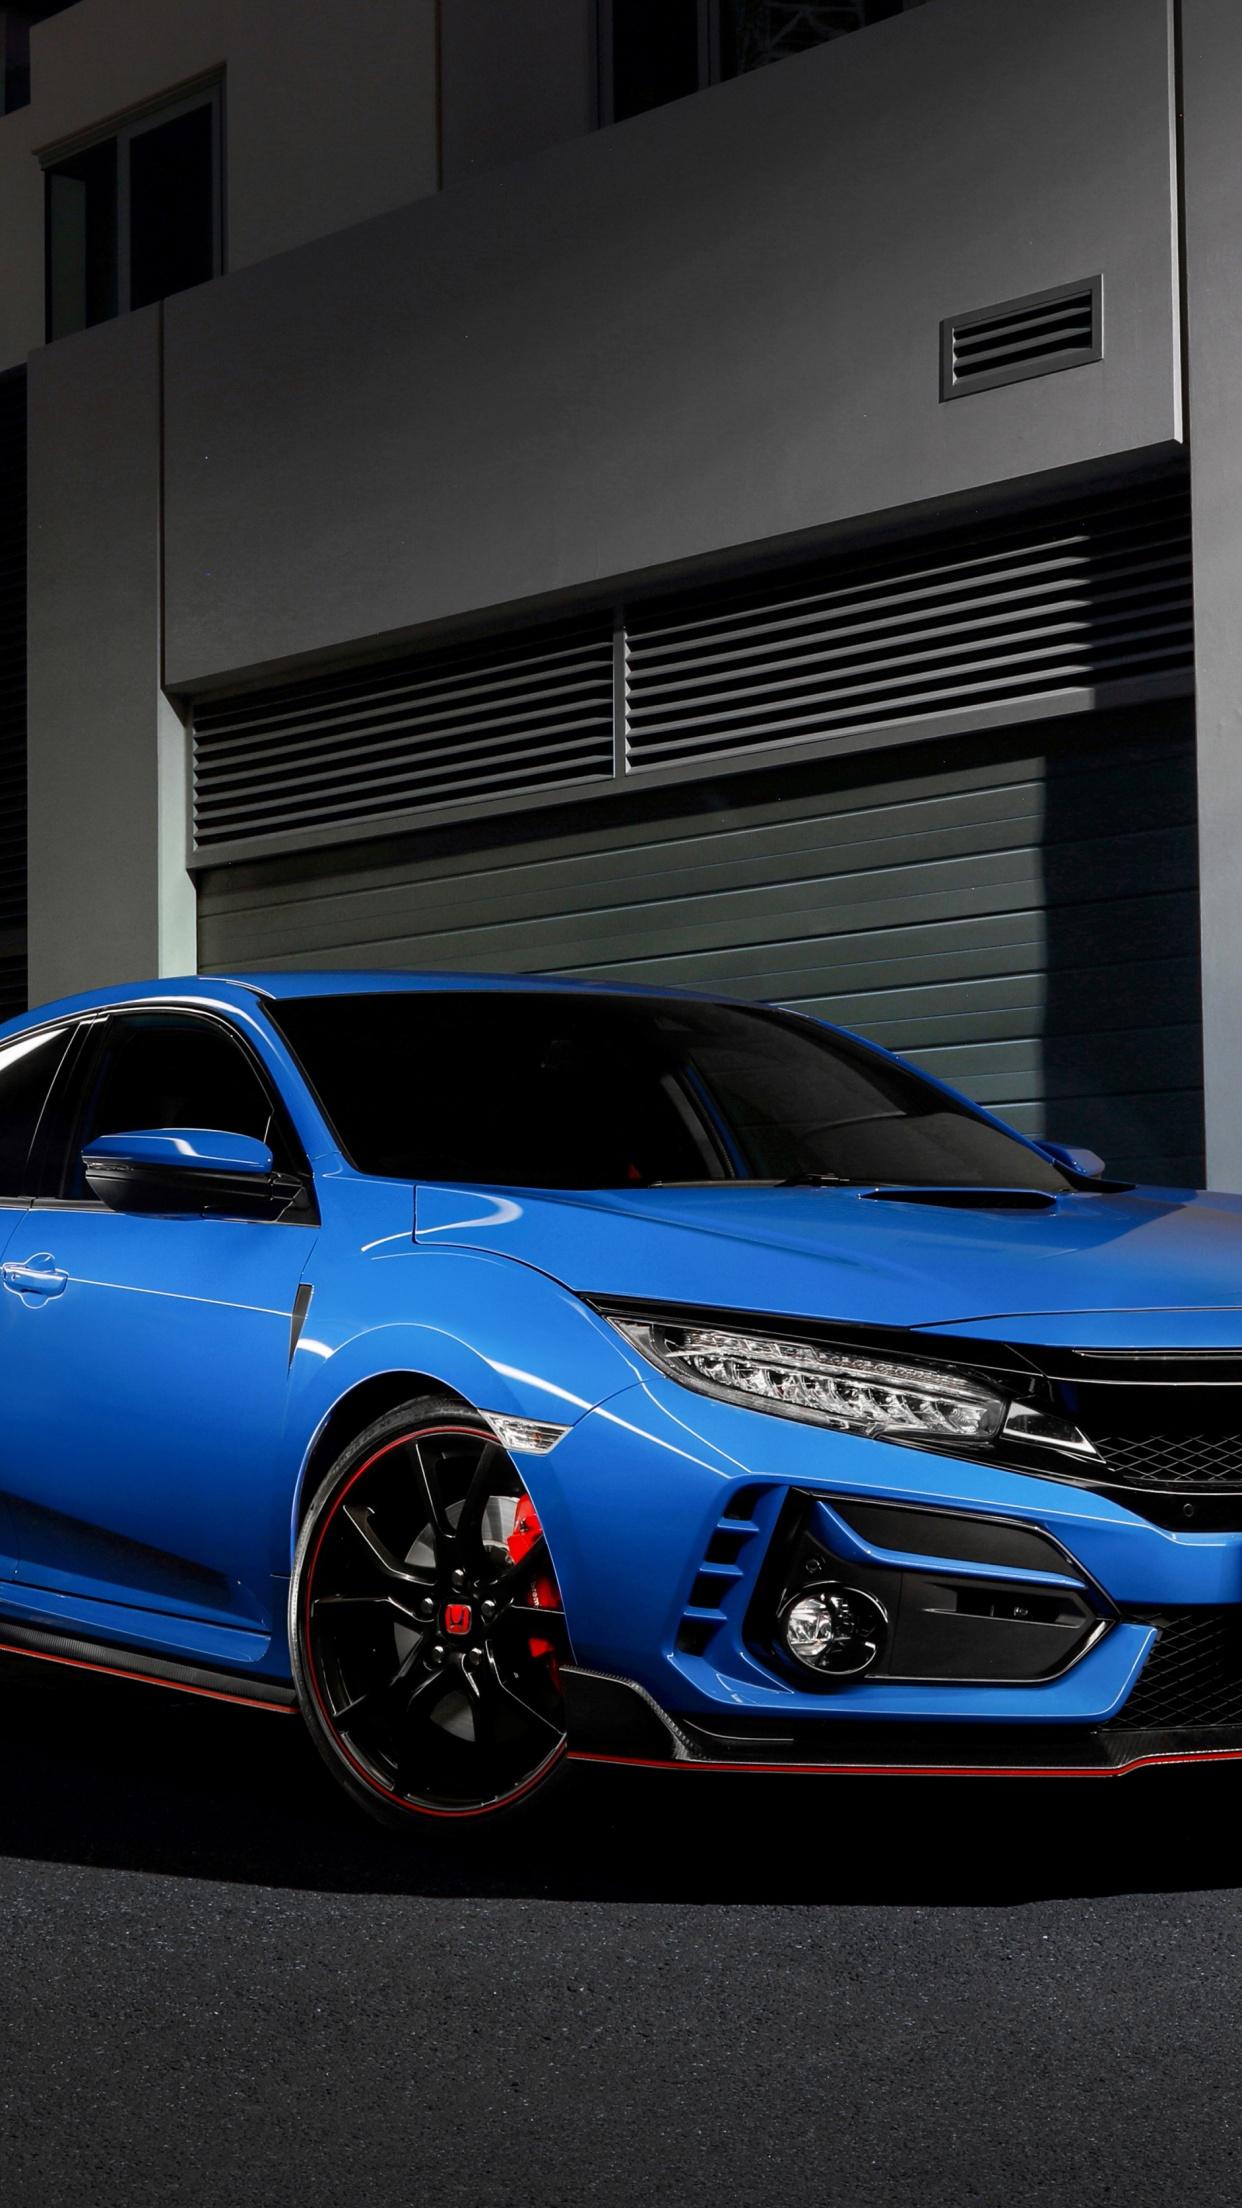 Honda Civic Type R 4k Wallpaper 2021 5k Black Dark 3852